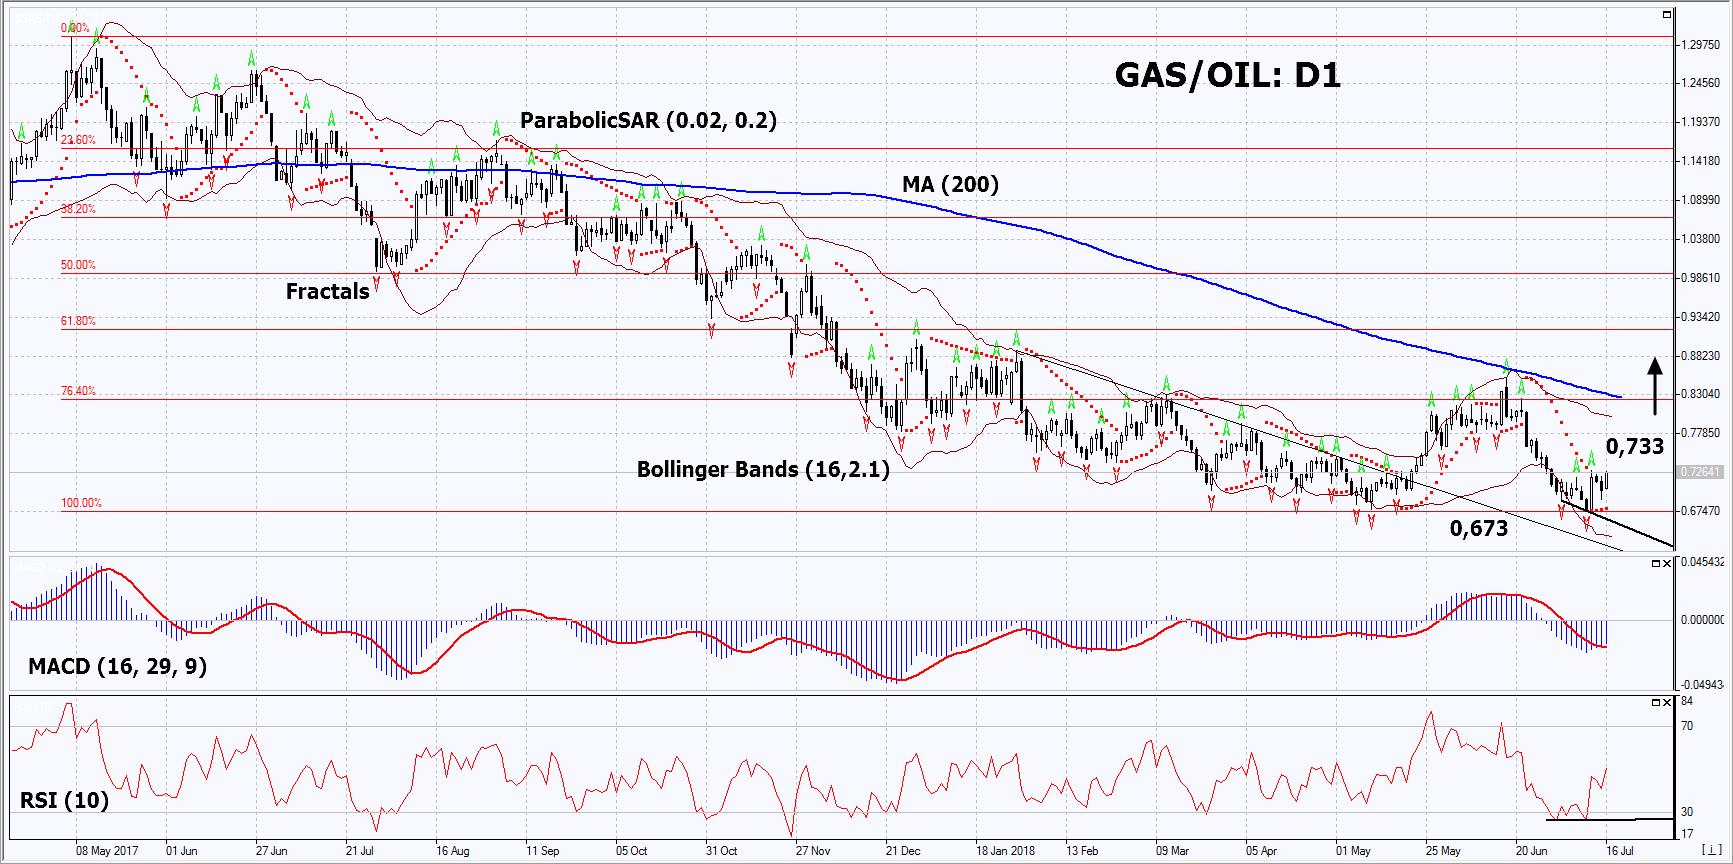 GAS/OIL